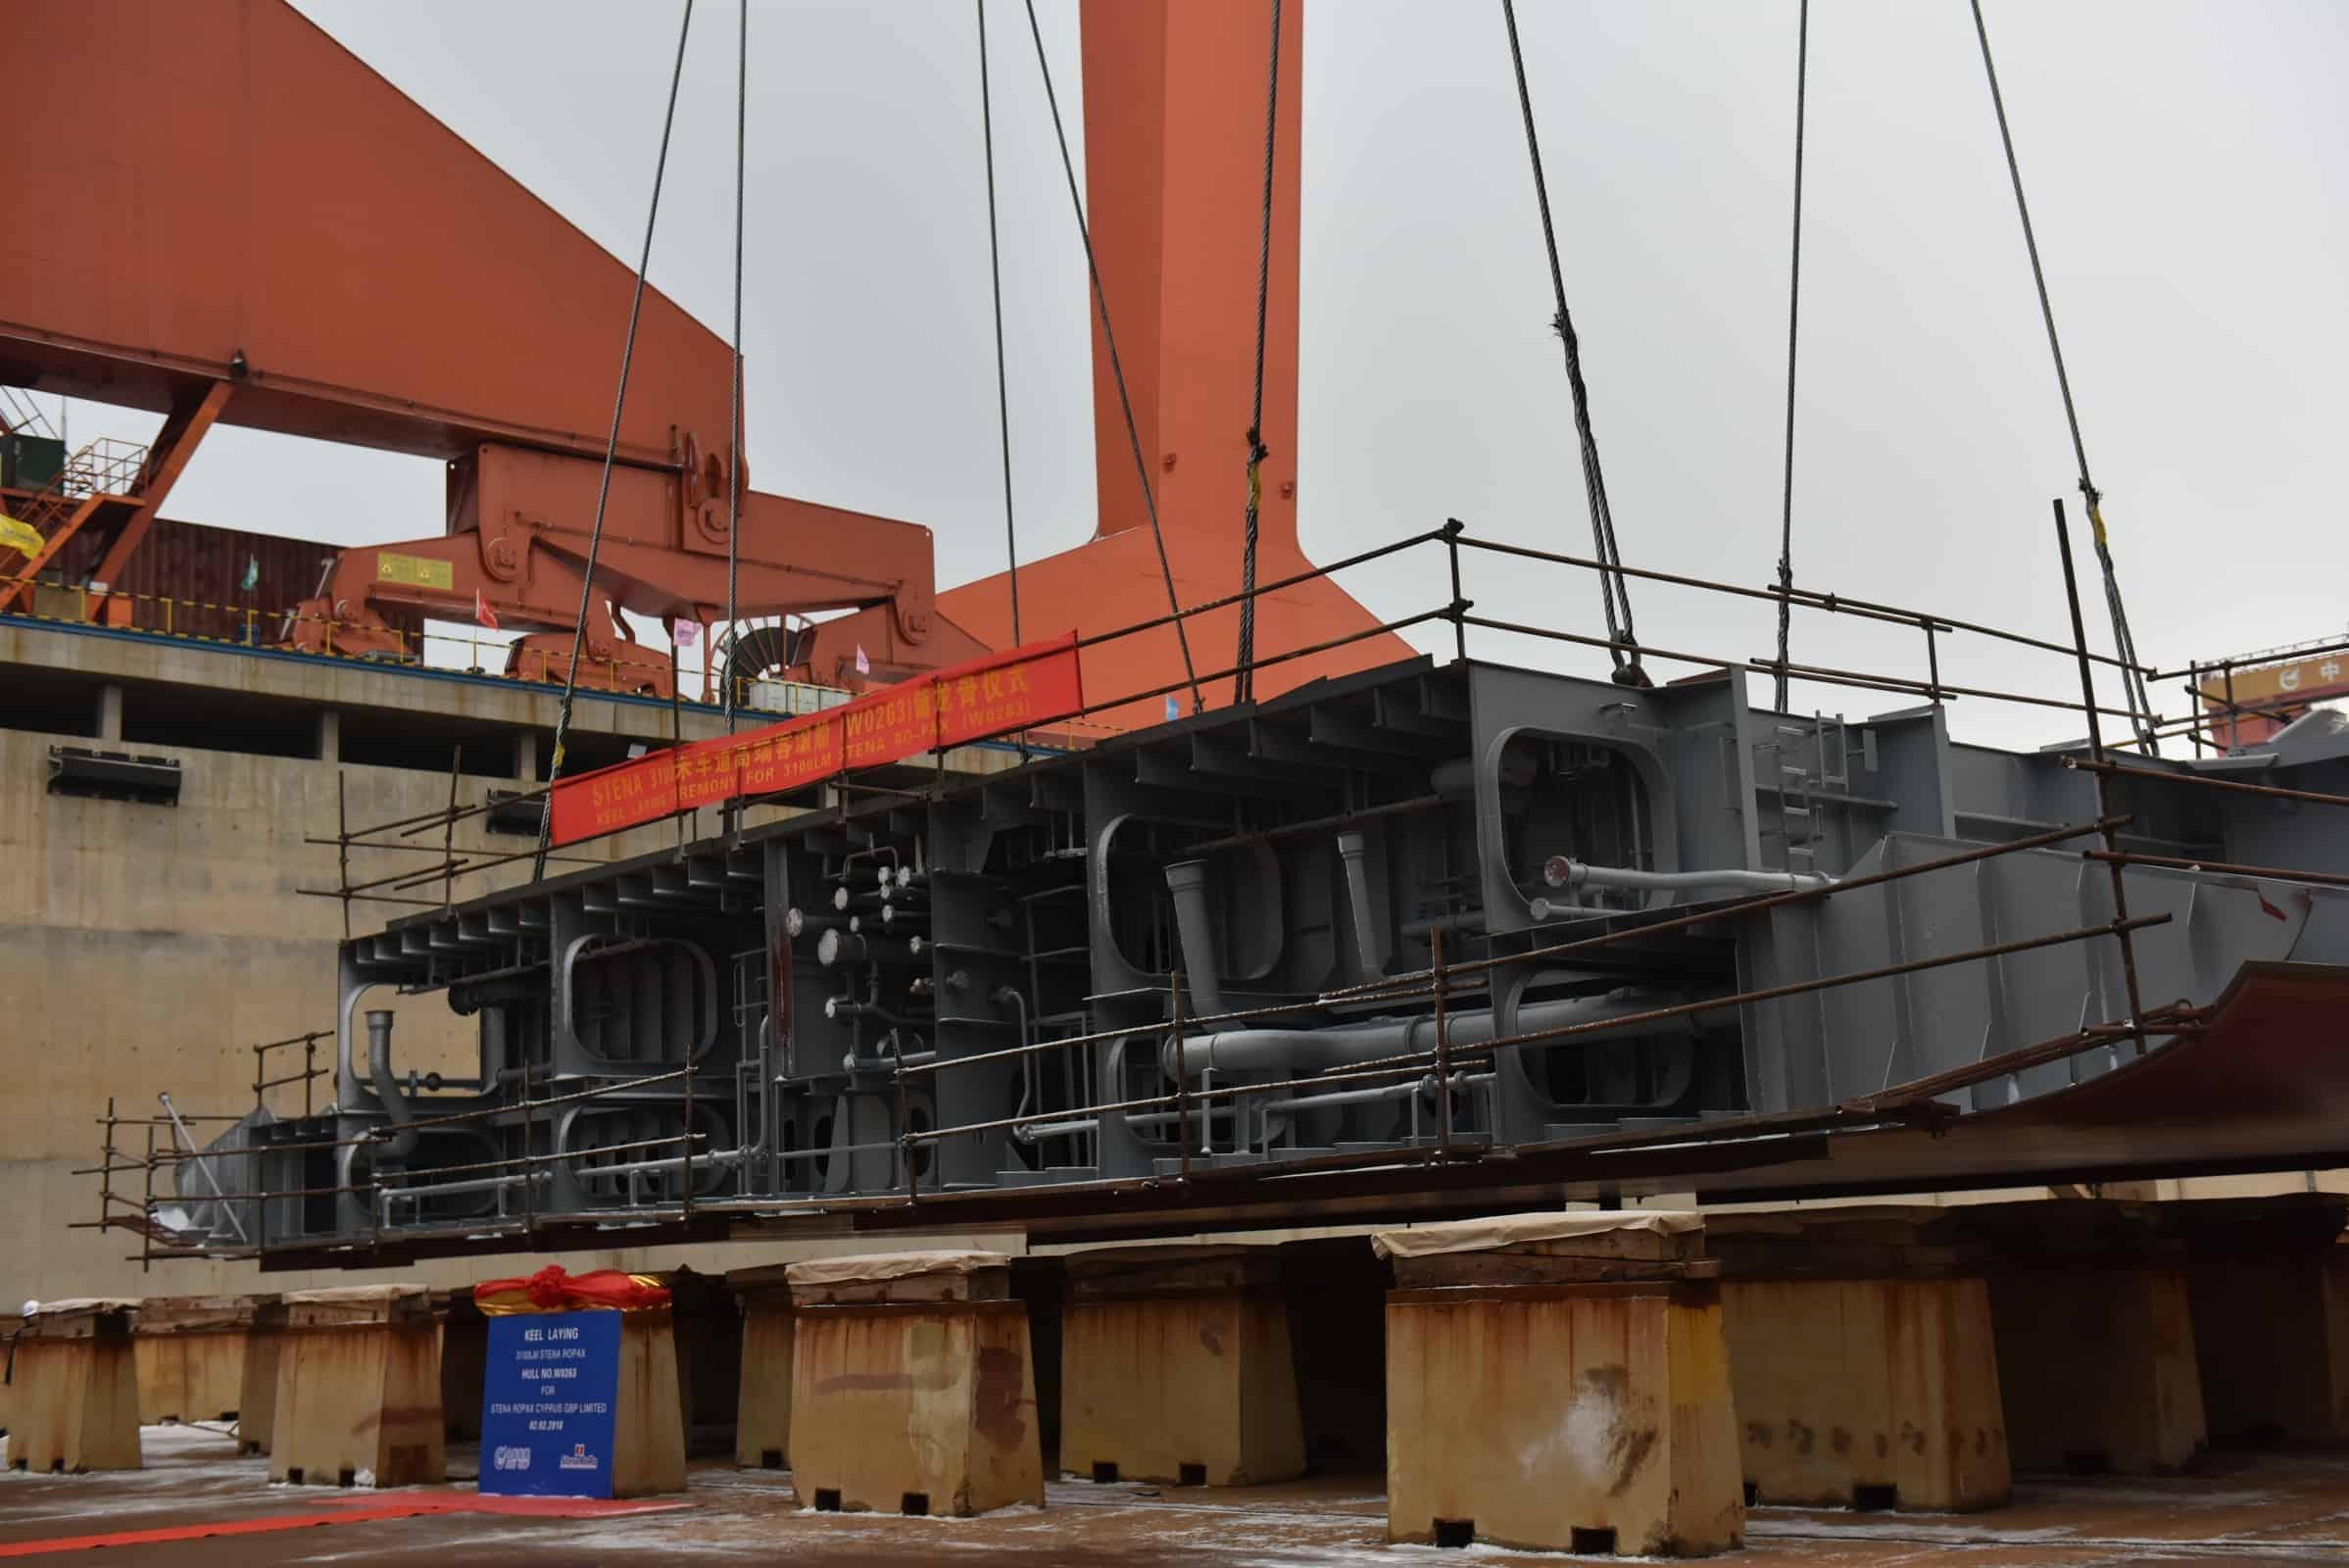 Stena E-Flexer keel laying ceremony at AVIC Weihai. Stena Line